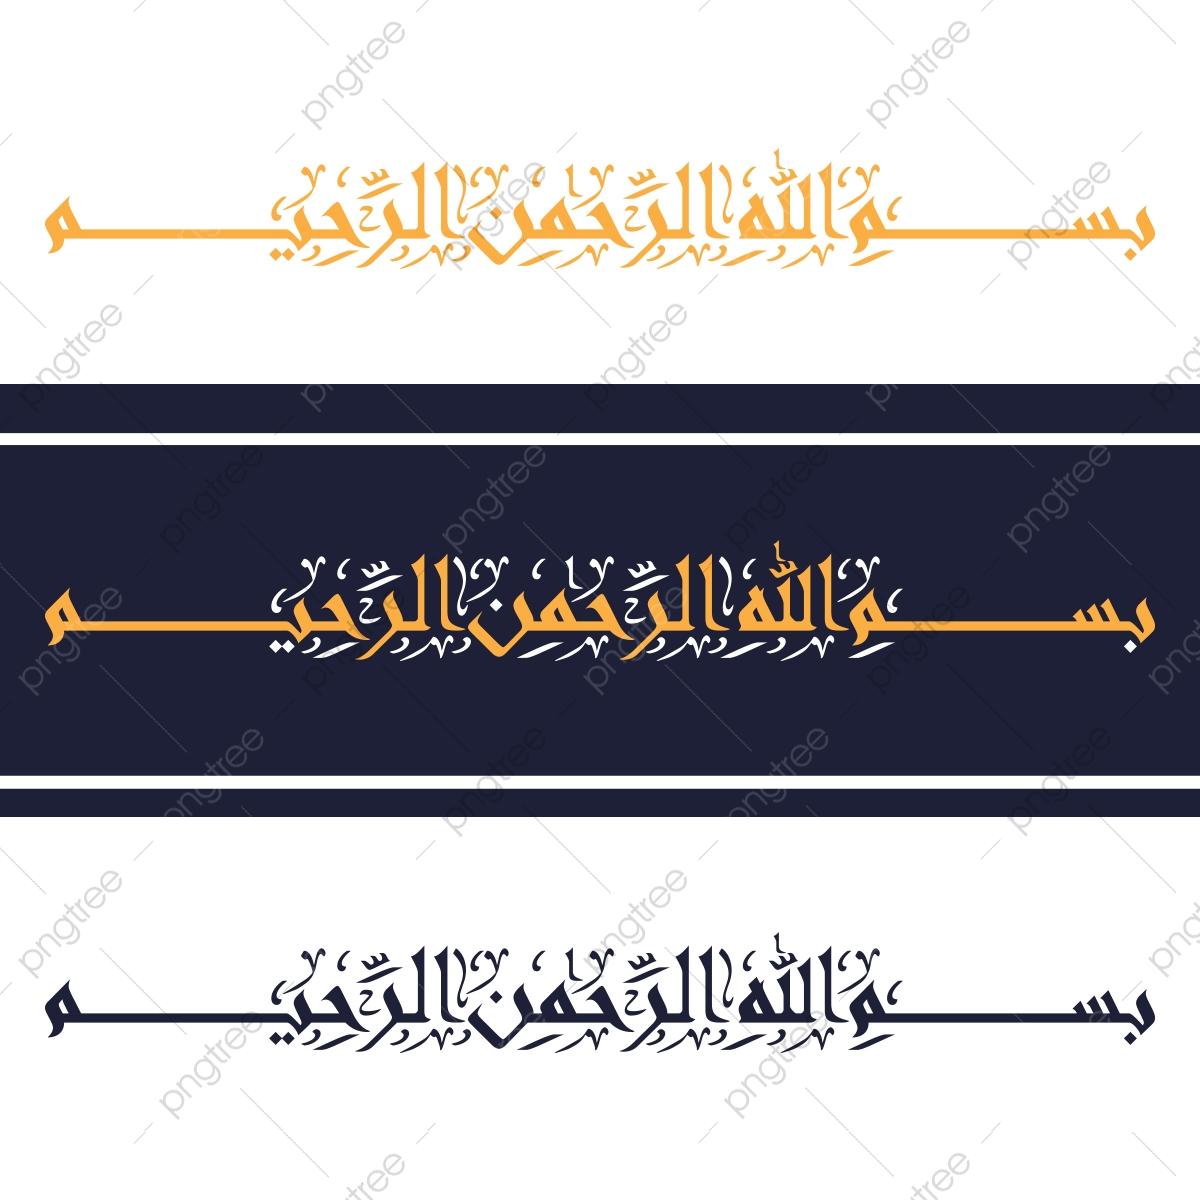 arab png images vector and psd files free download on pngtree https pngtree com freepng bismillah arabic calligraphy design 5495880 html